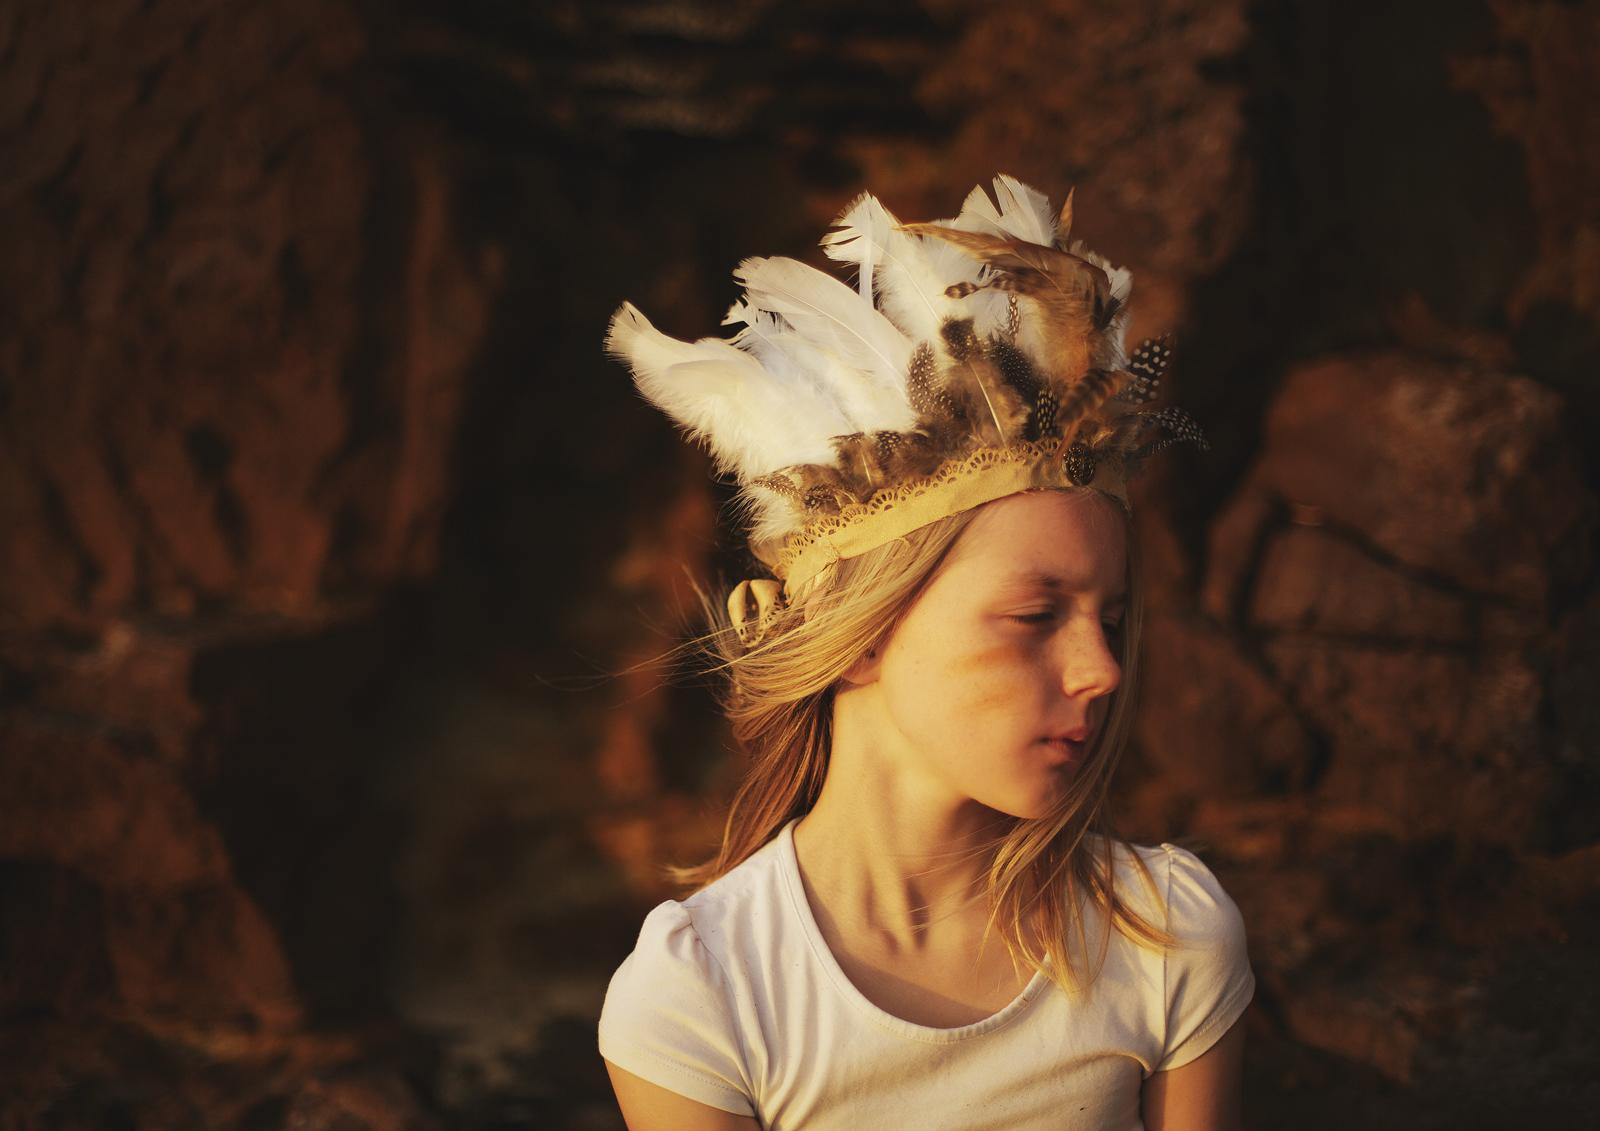 Little girl's Indian head dress